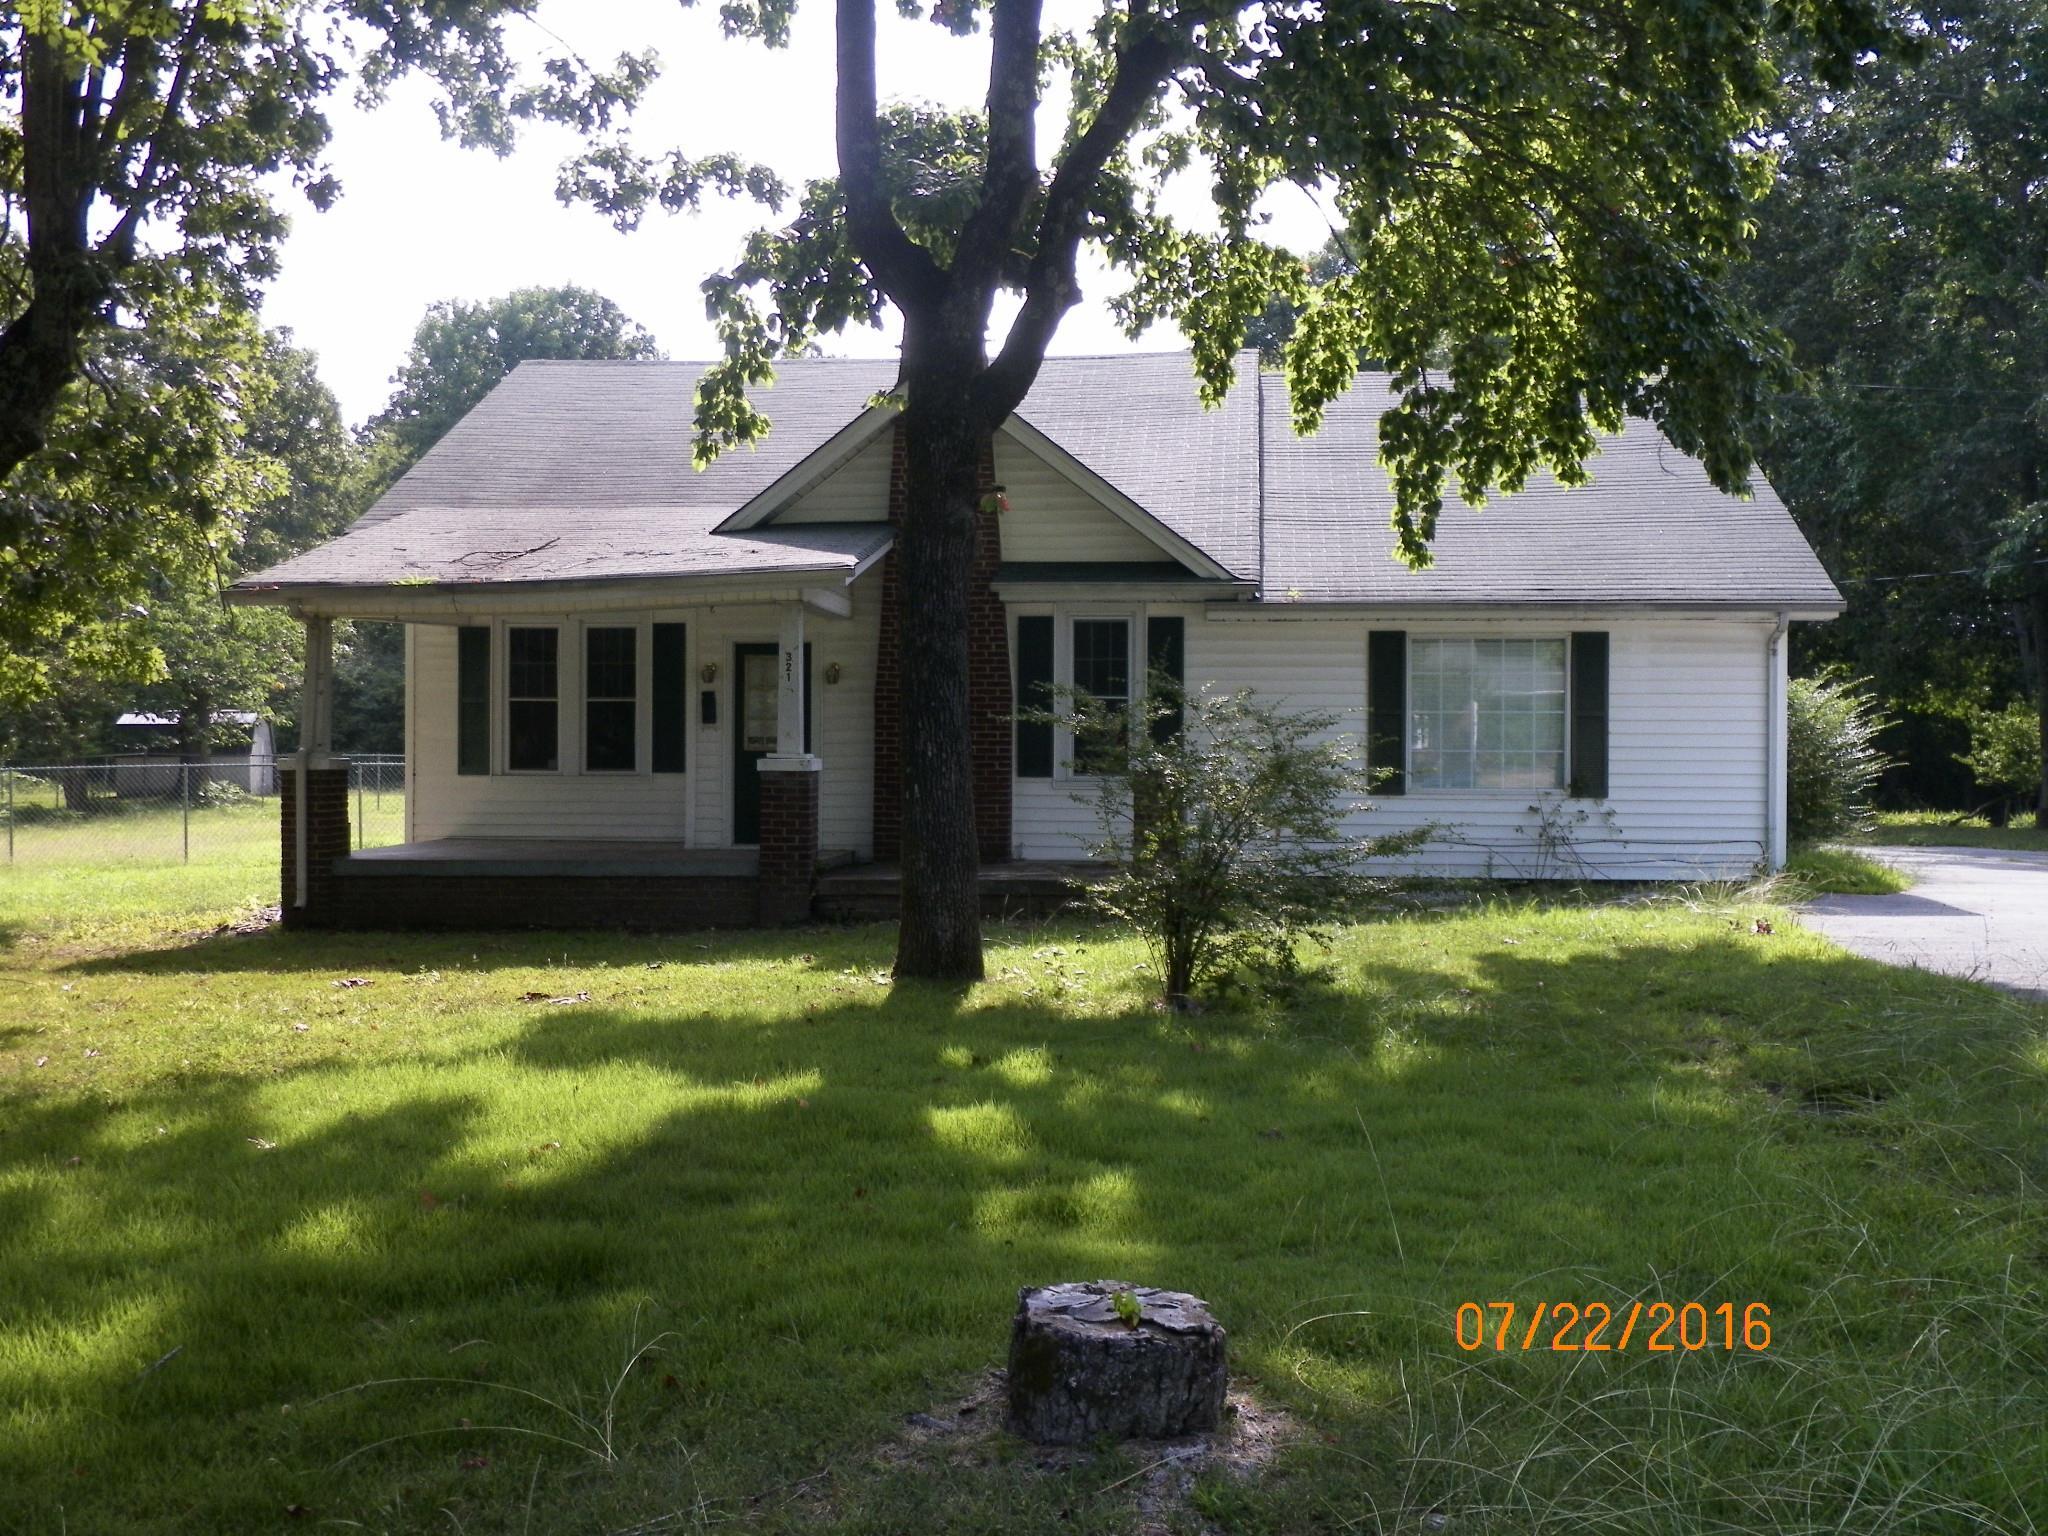 321 N Park St, Hohenwald, TN 38462